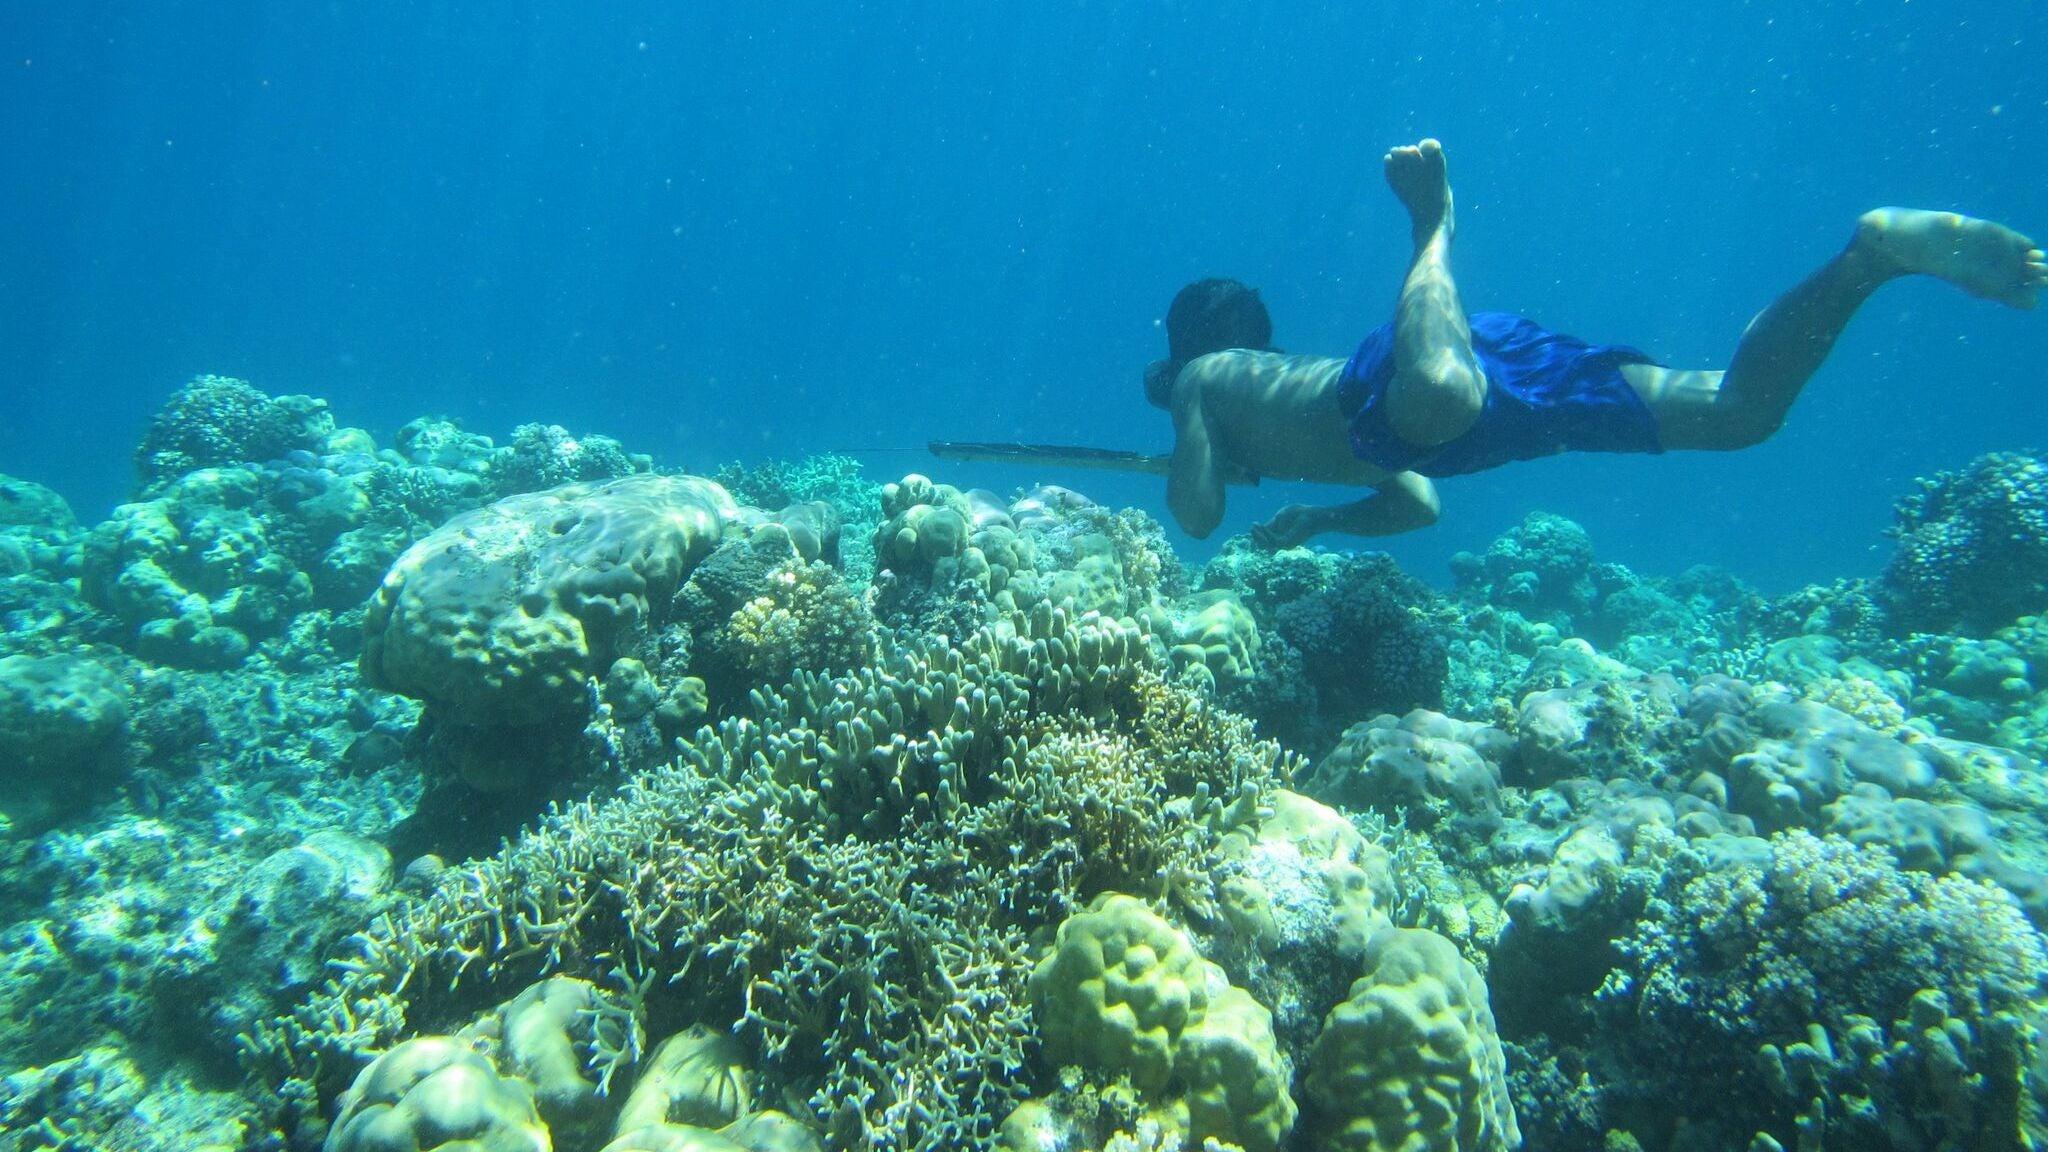 Rare Mutation Among Bajau People Lets Them Stay Underwater Longer